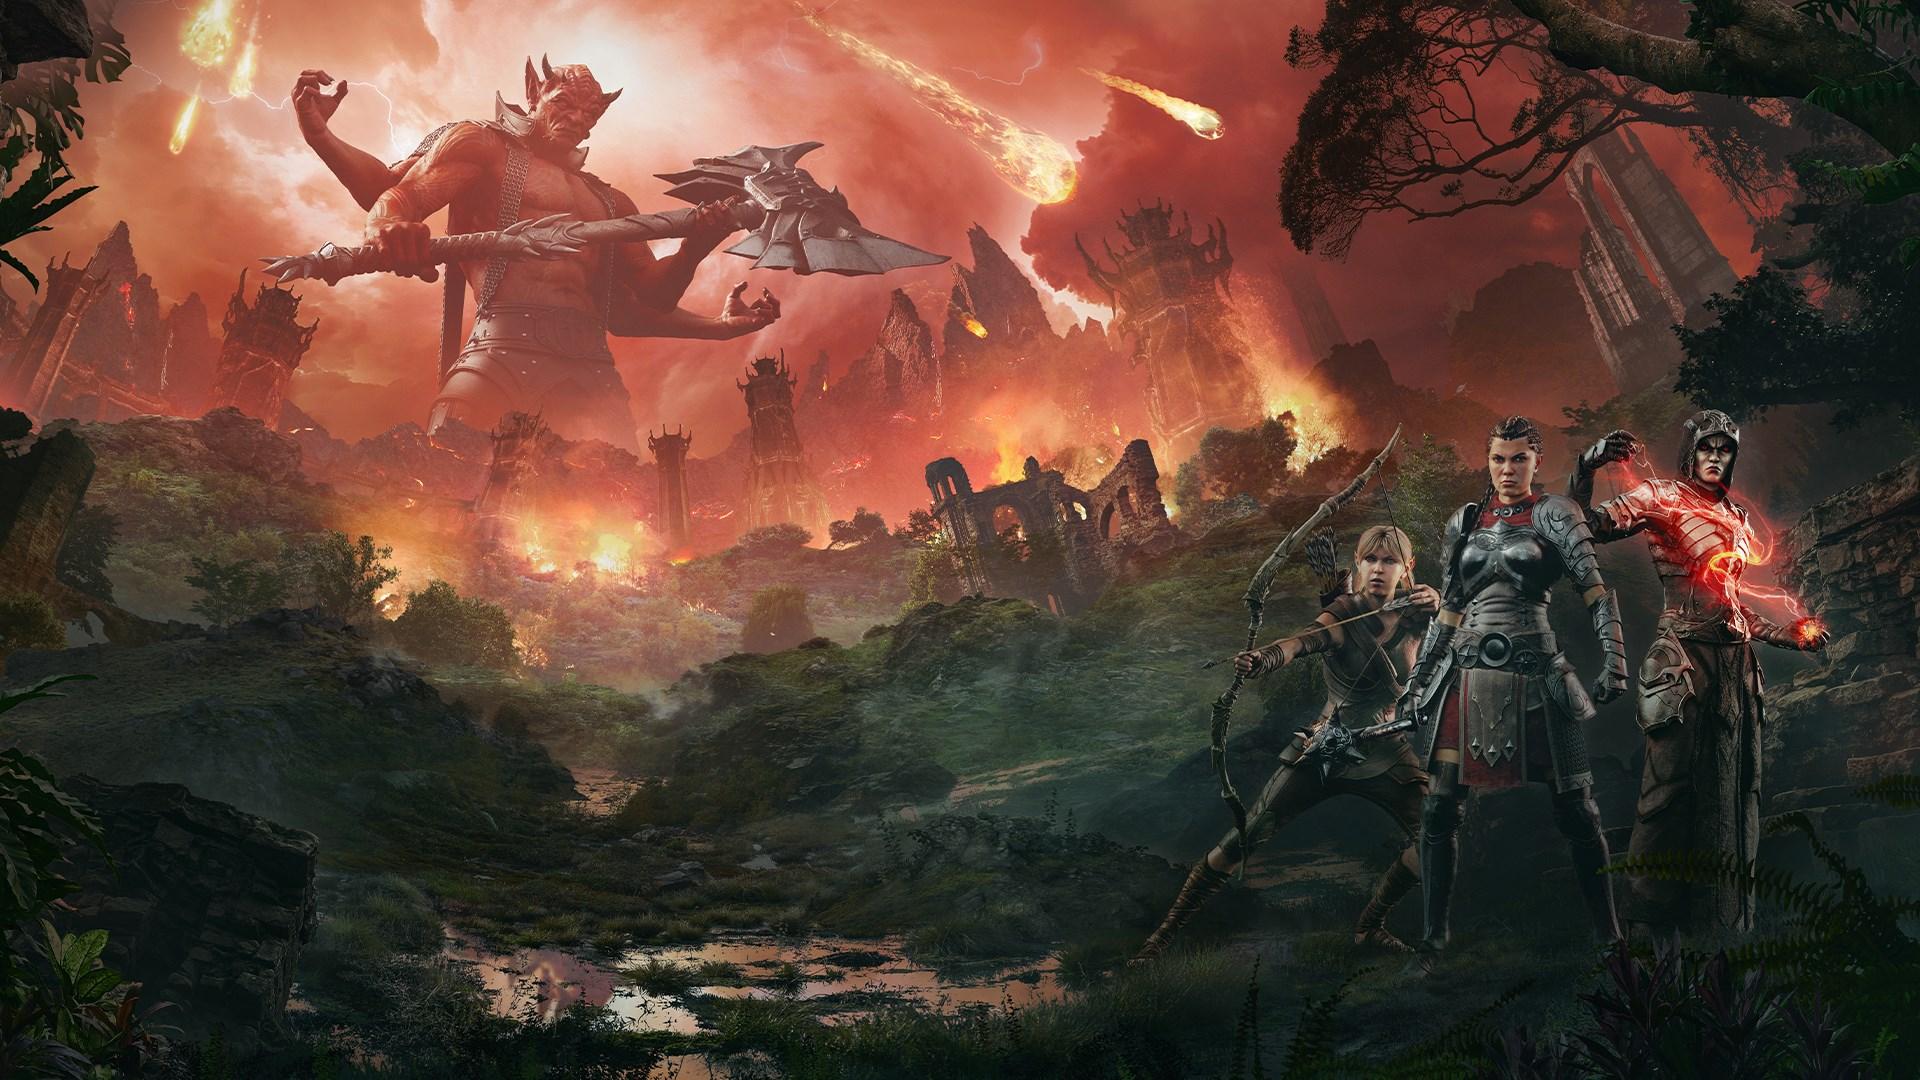 The Elder Scrolls Online: Blackwood CE Upgrade